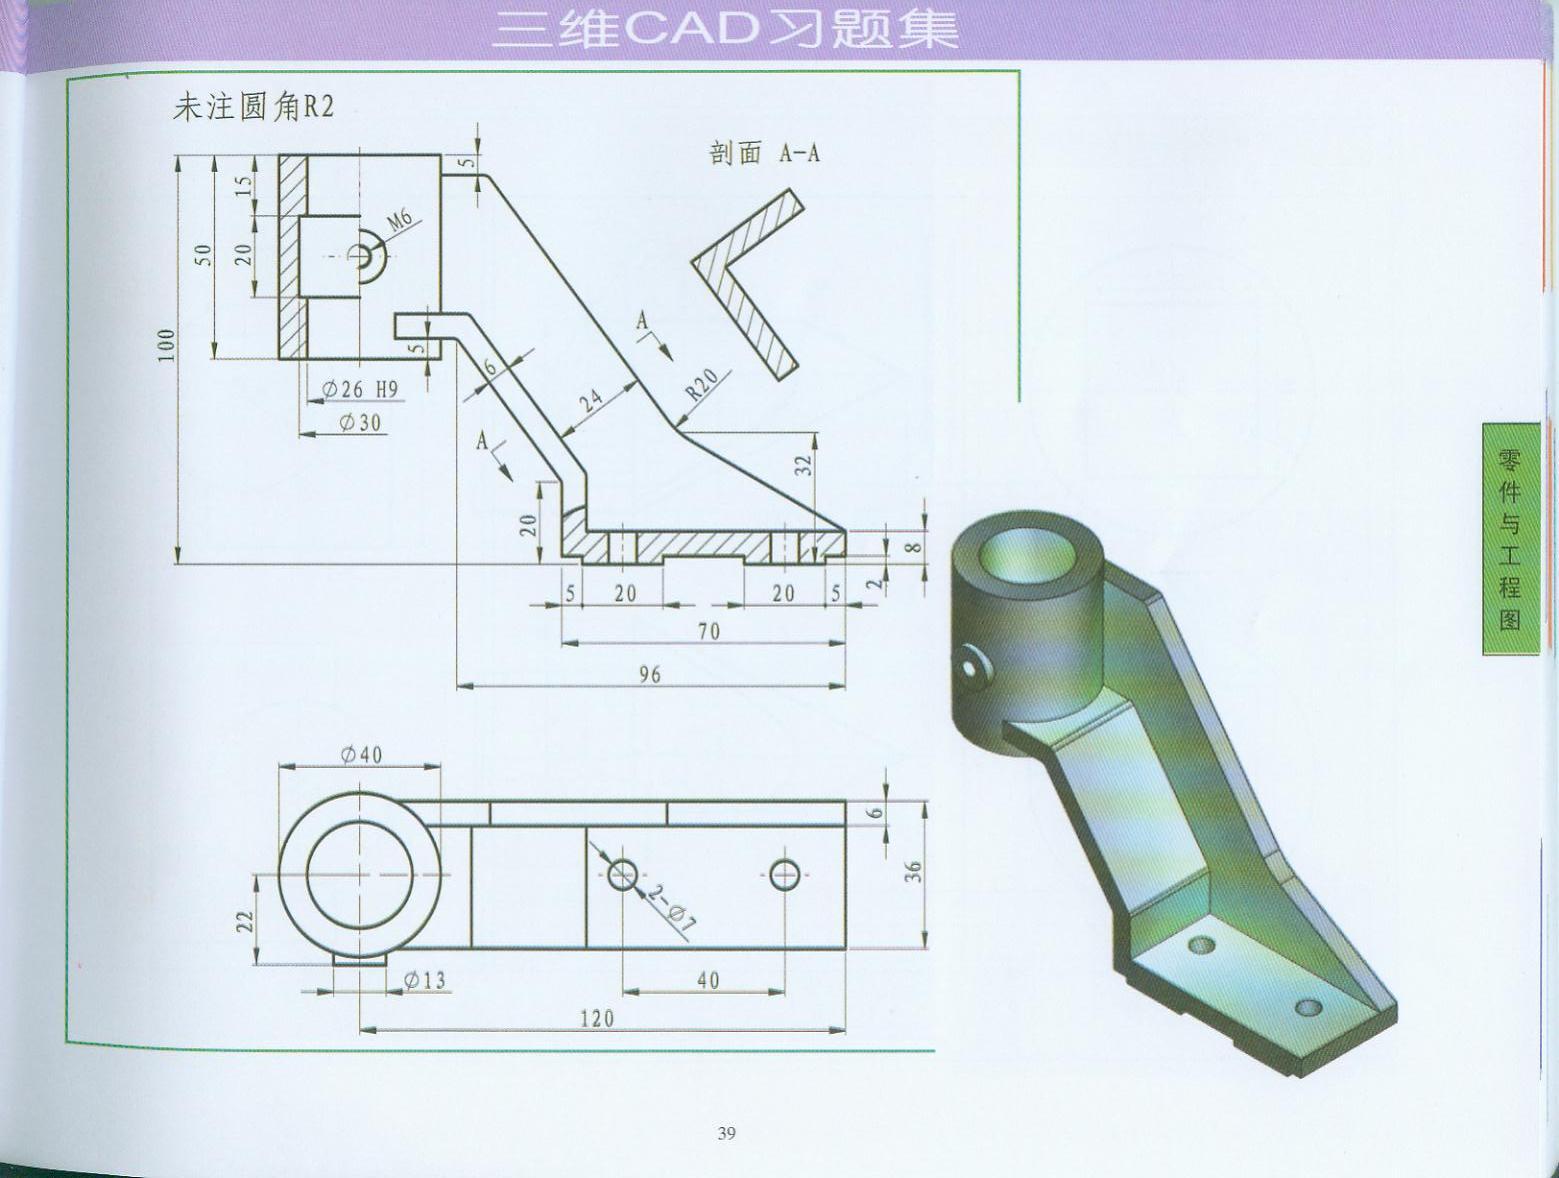 cad机械制图基础_cad三维机械练习题库-海达范文网